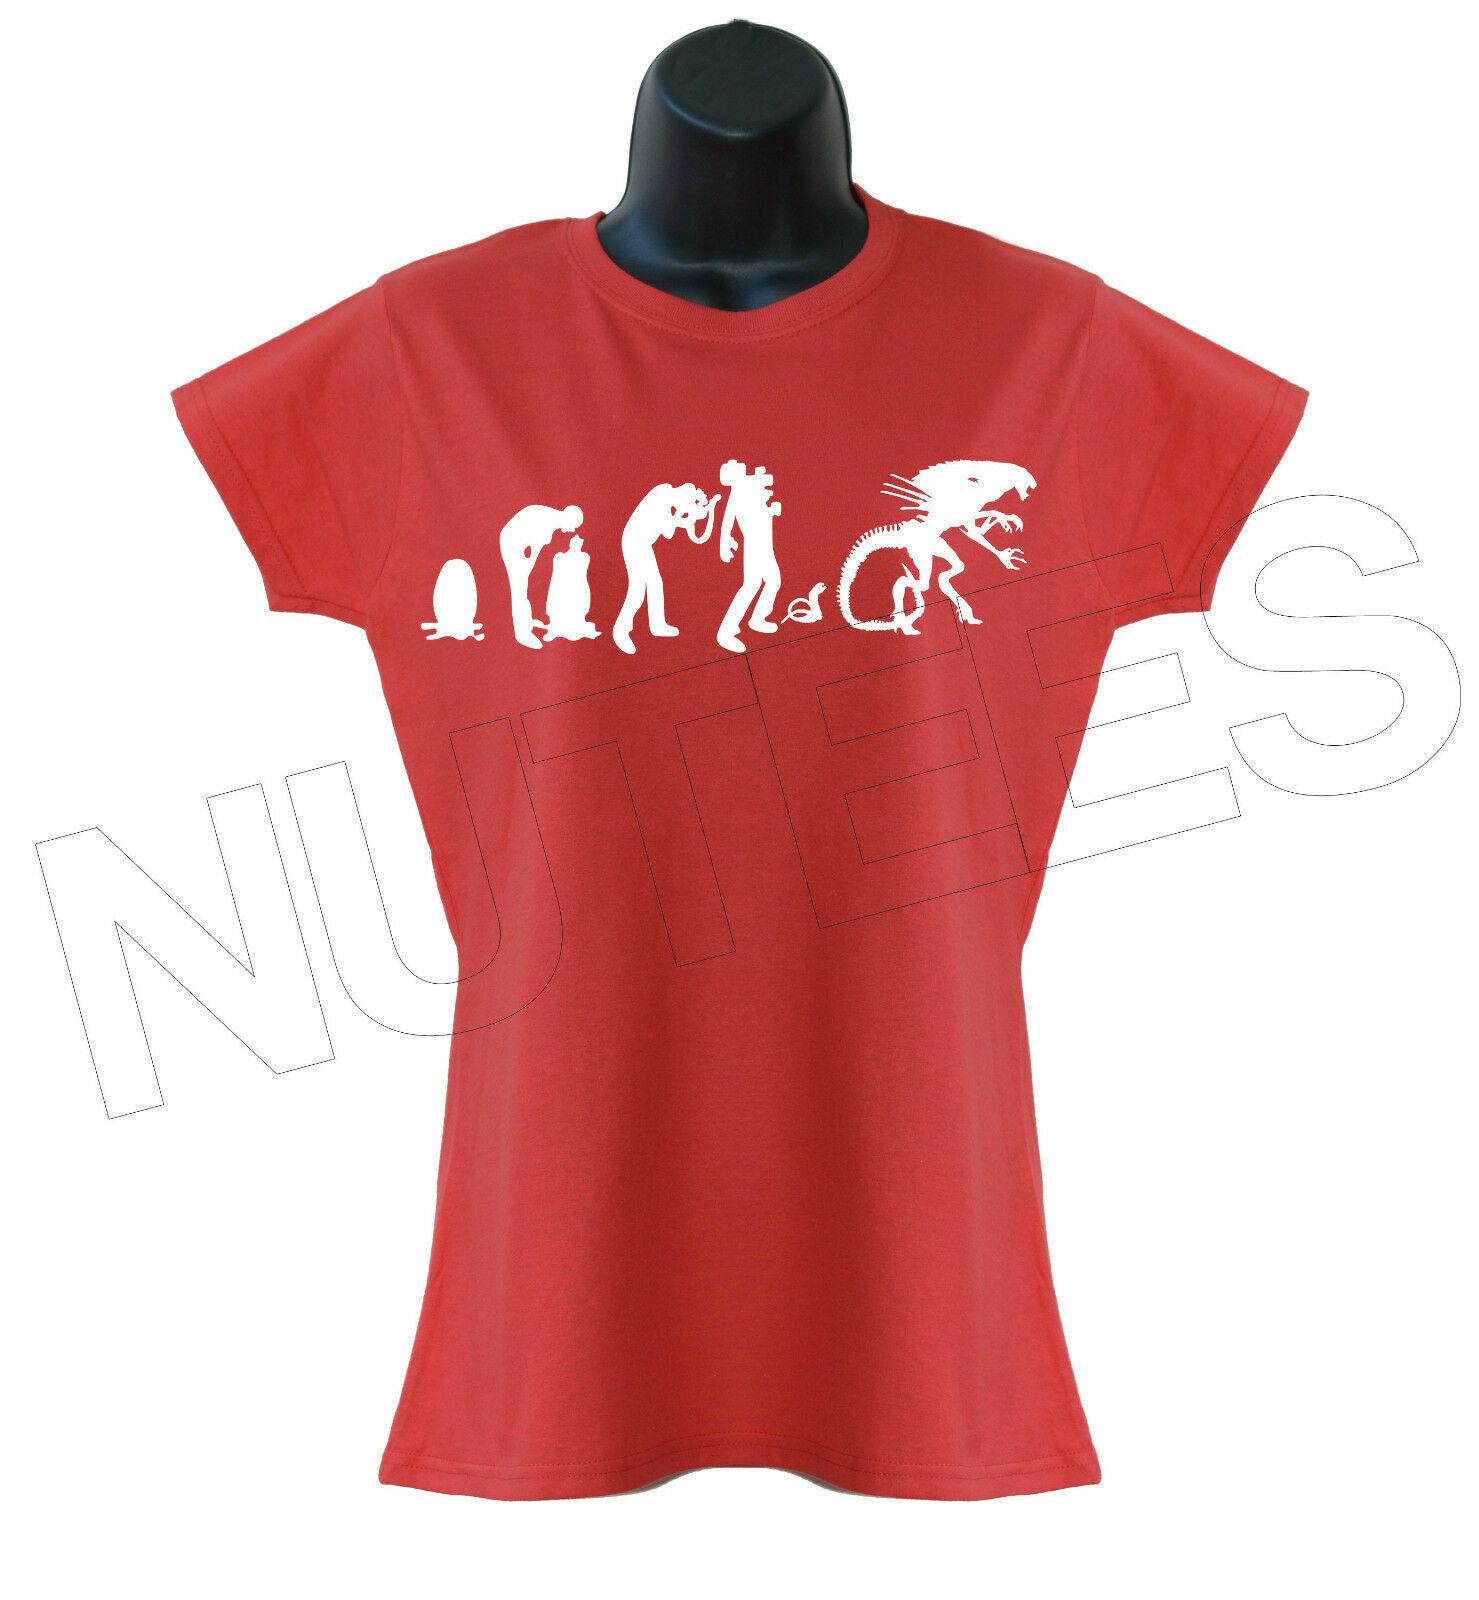 EVOLUTION LINE DANCE country music New Mens Womens T SHIRT TOP 8-16 s m l xl xxl